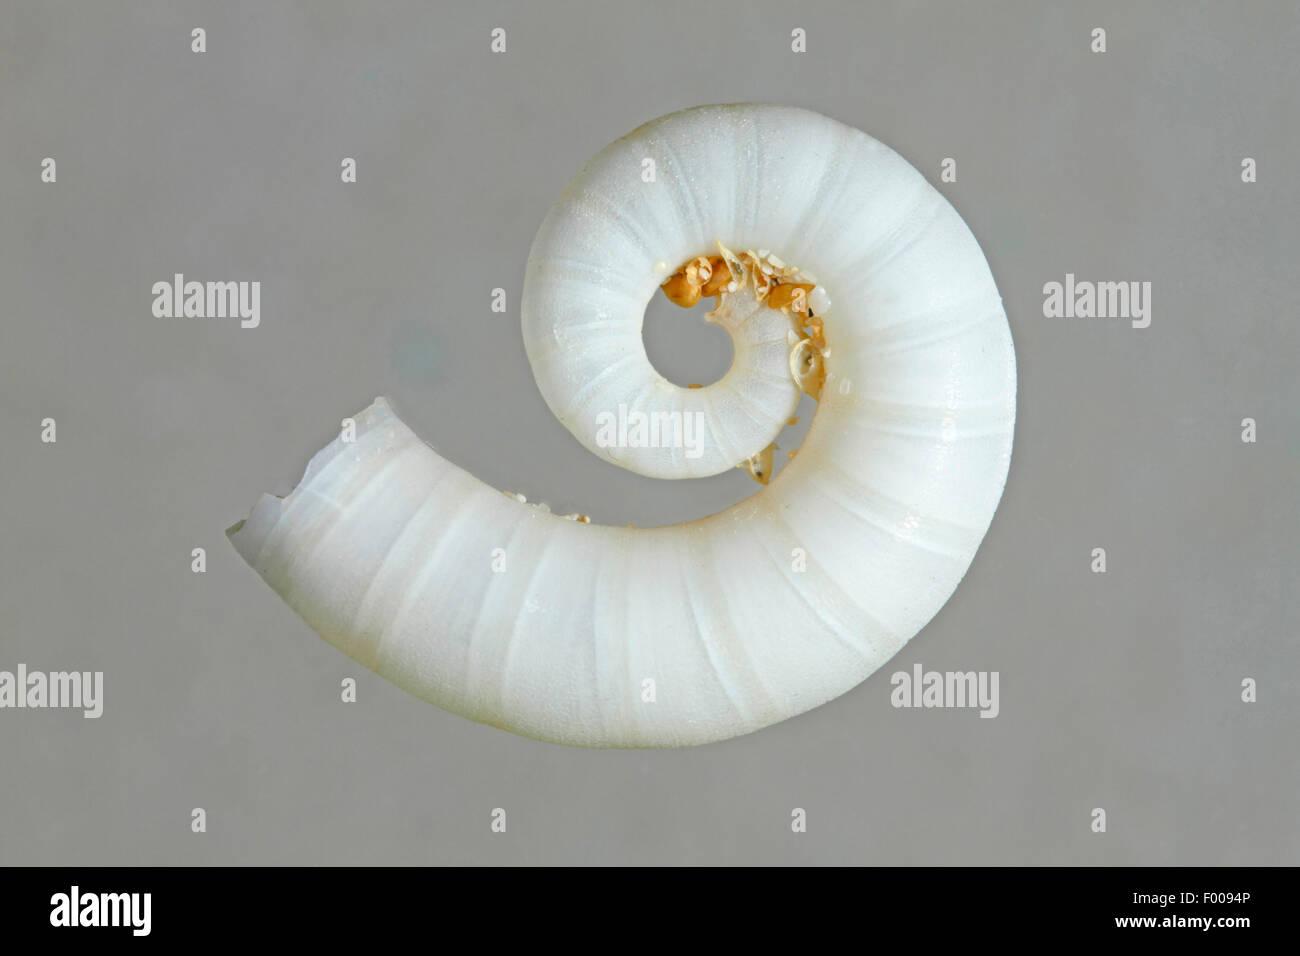 Ram's Horn, squid spirula Spirula spirula (commune), phragmocone en face de fond gris Banque D'Images